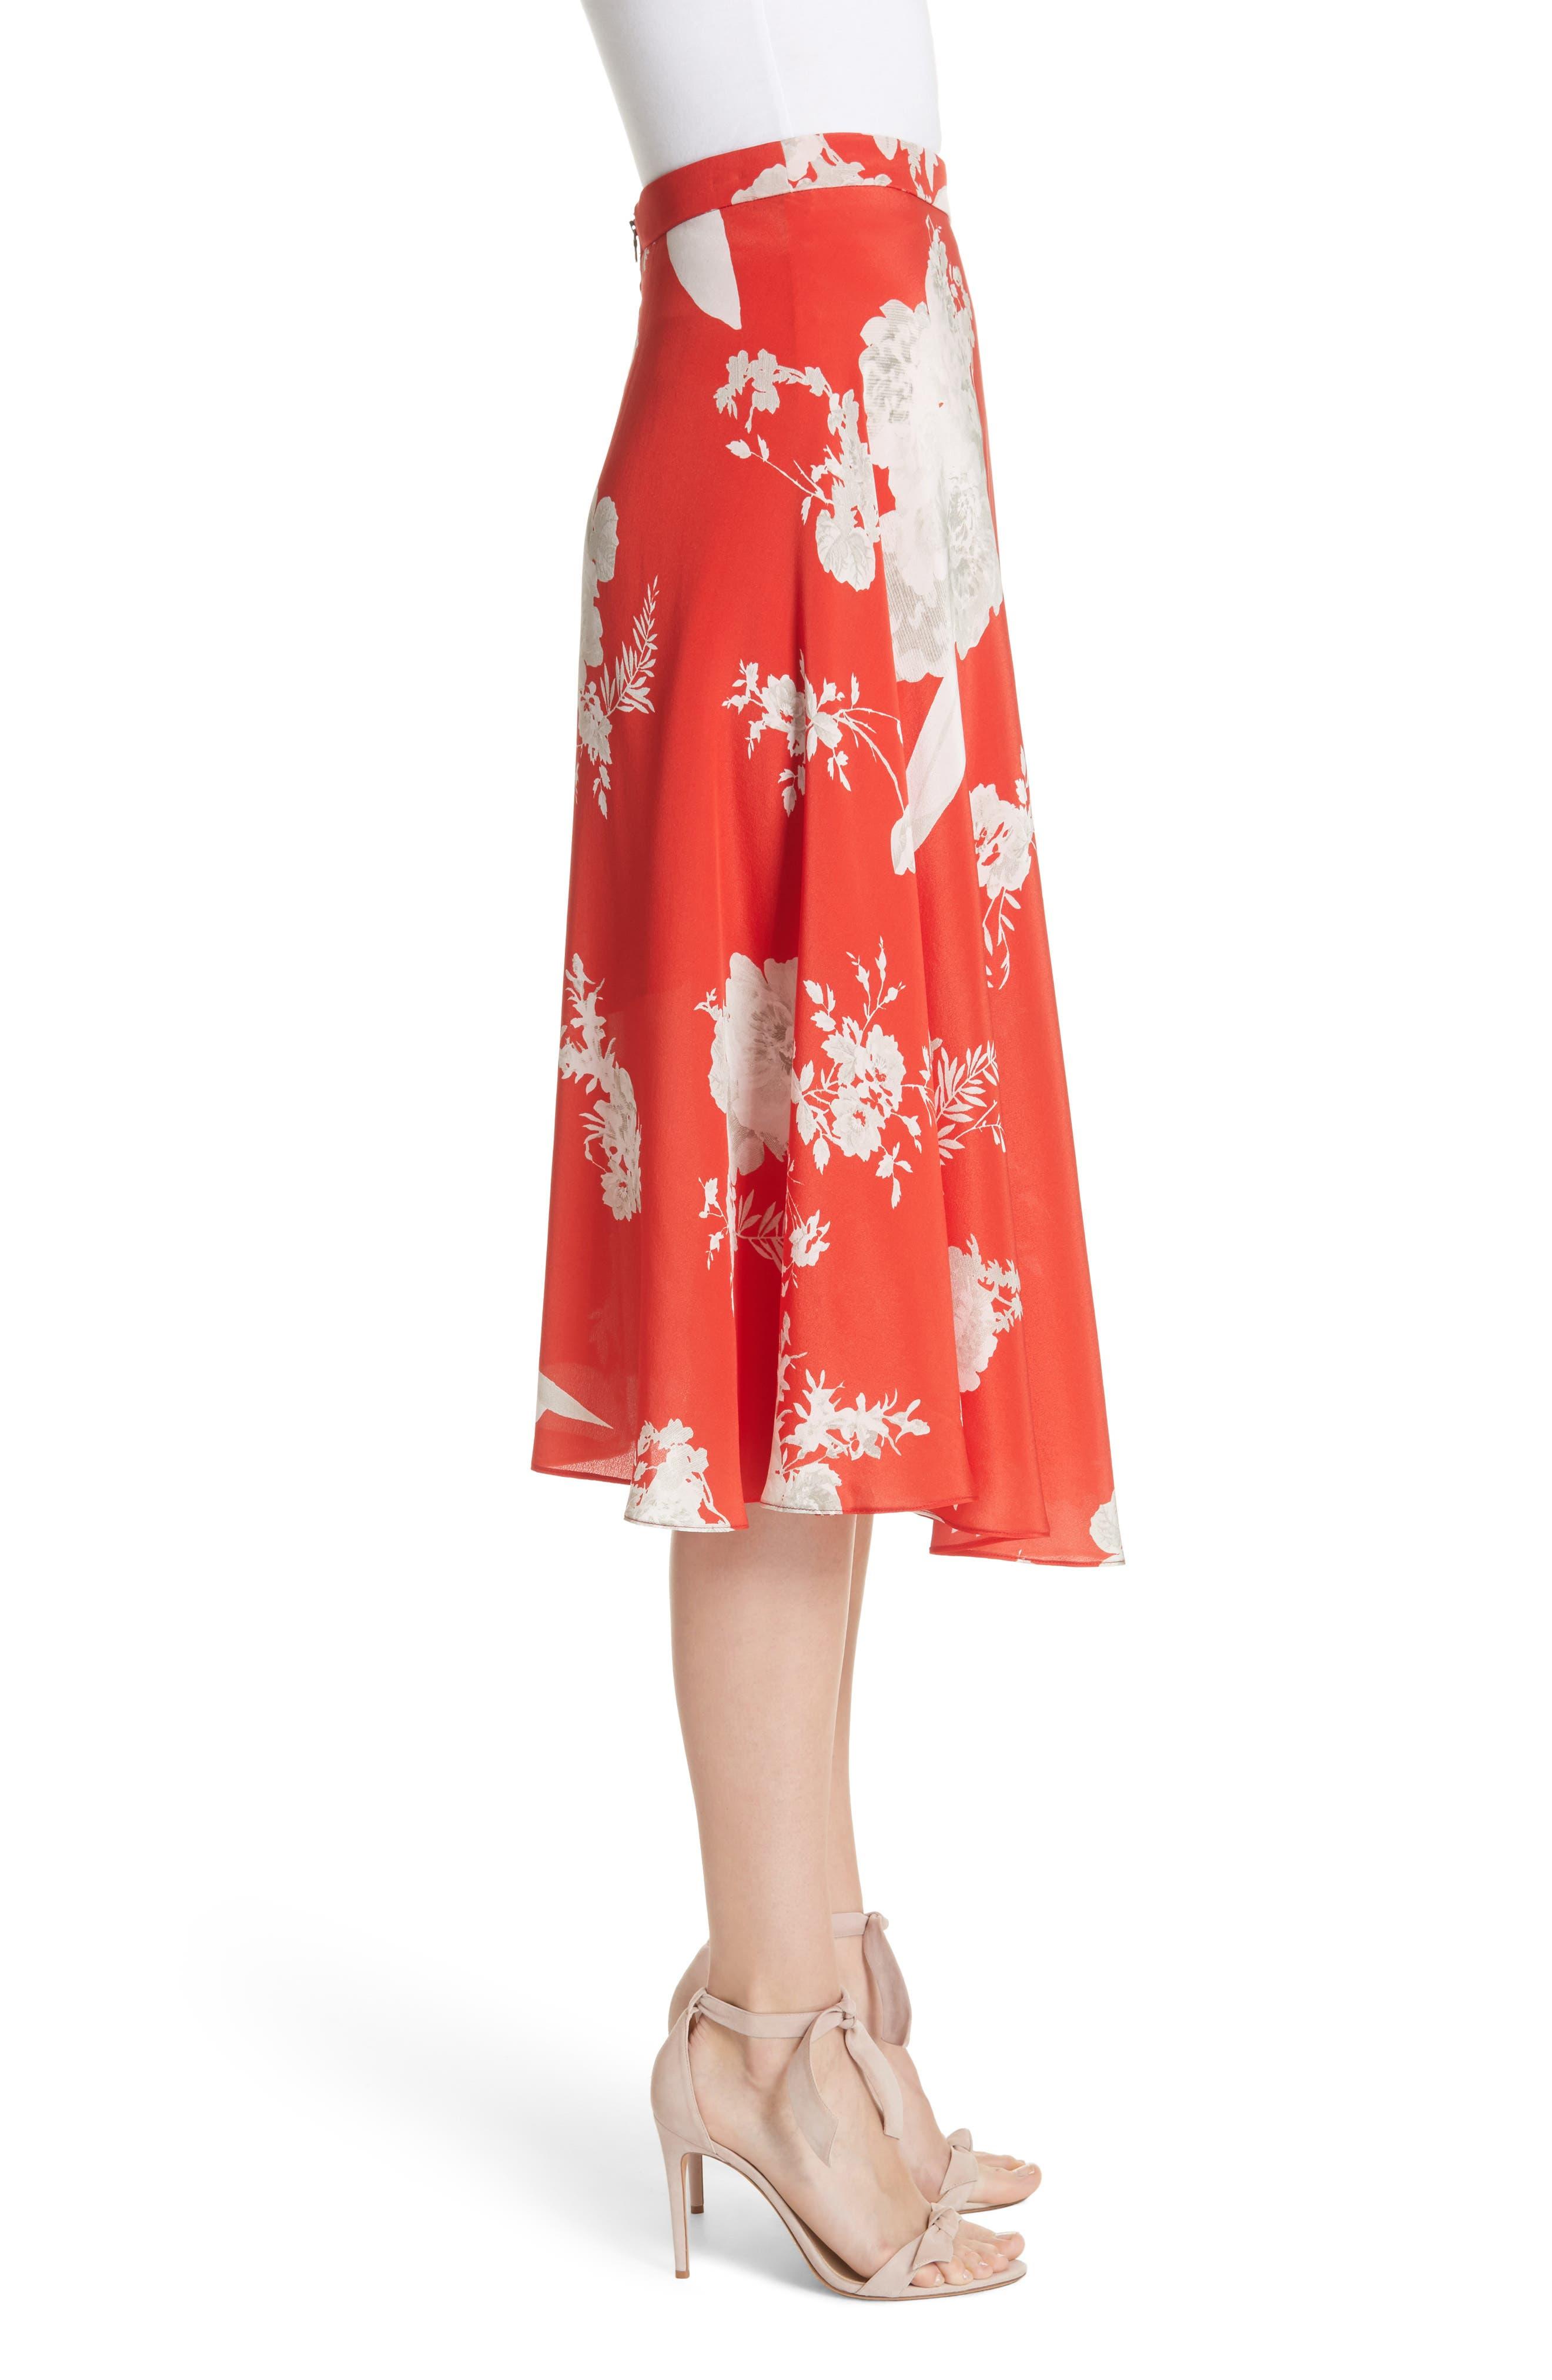 ALICE + OLIVIA,                             Nanette Faux Wrap Floral Silk Skirt,                             Alternate thumbnail 3, color,                             606